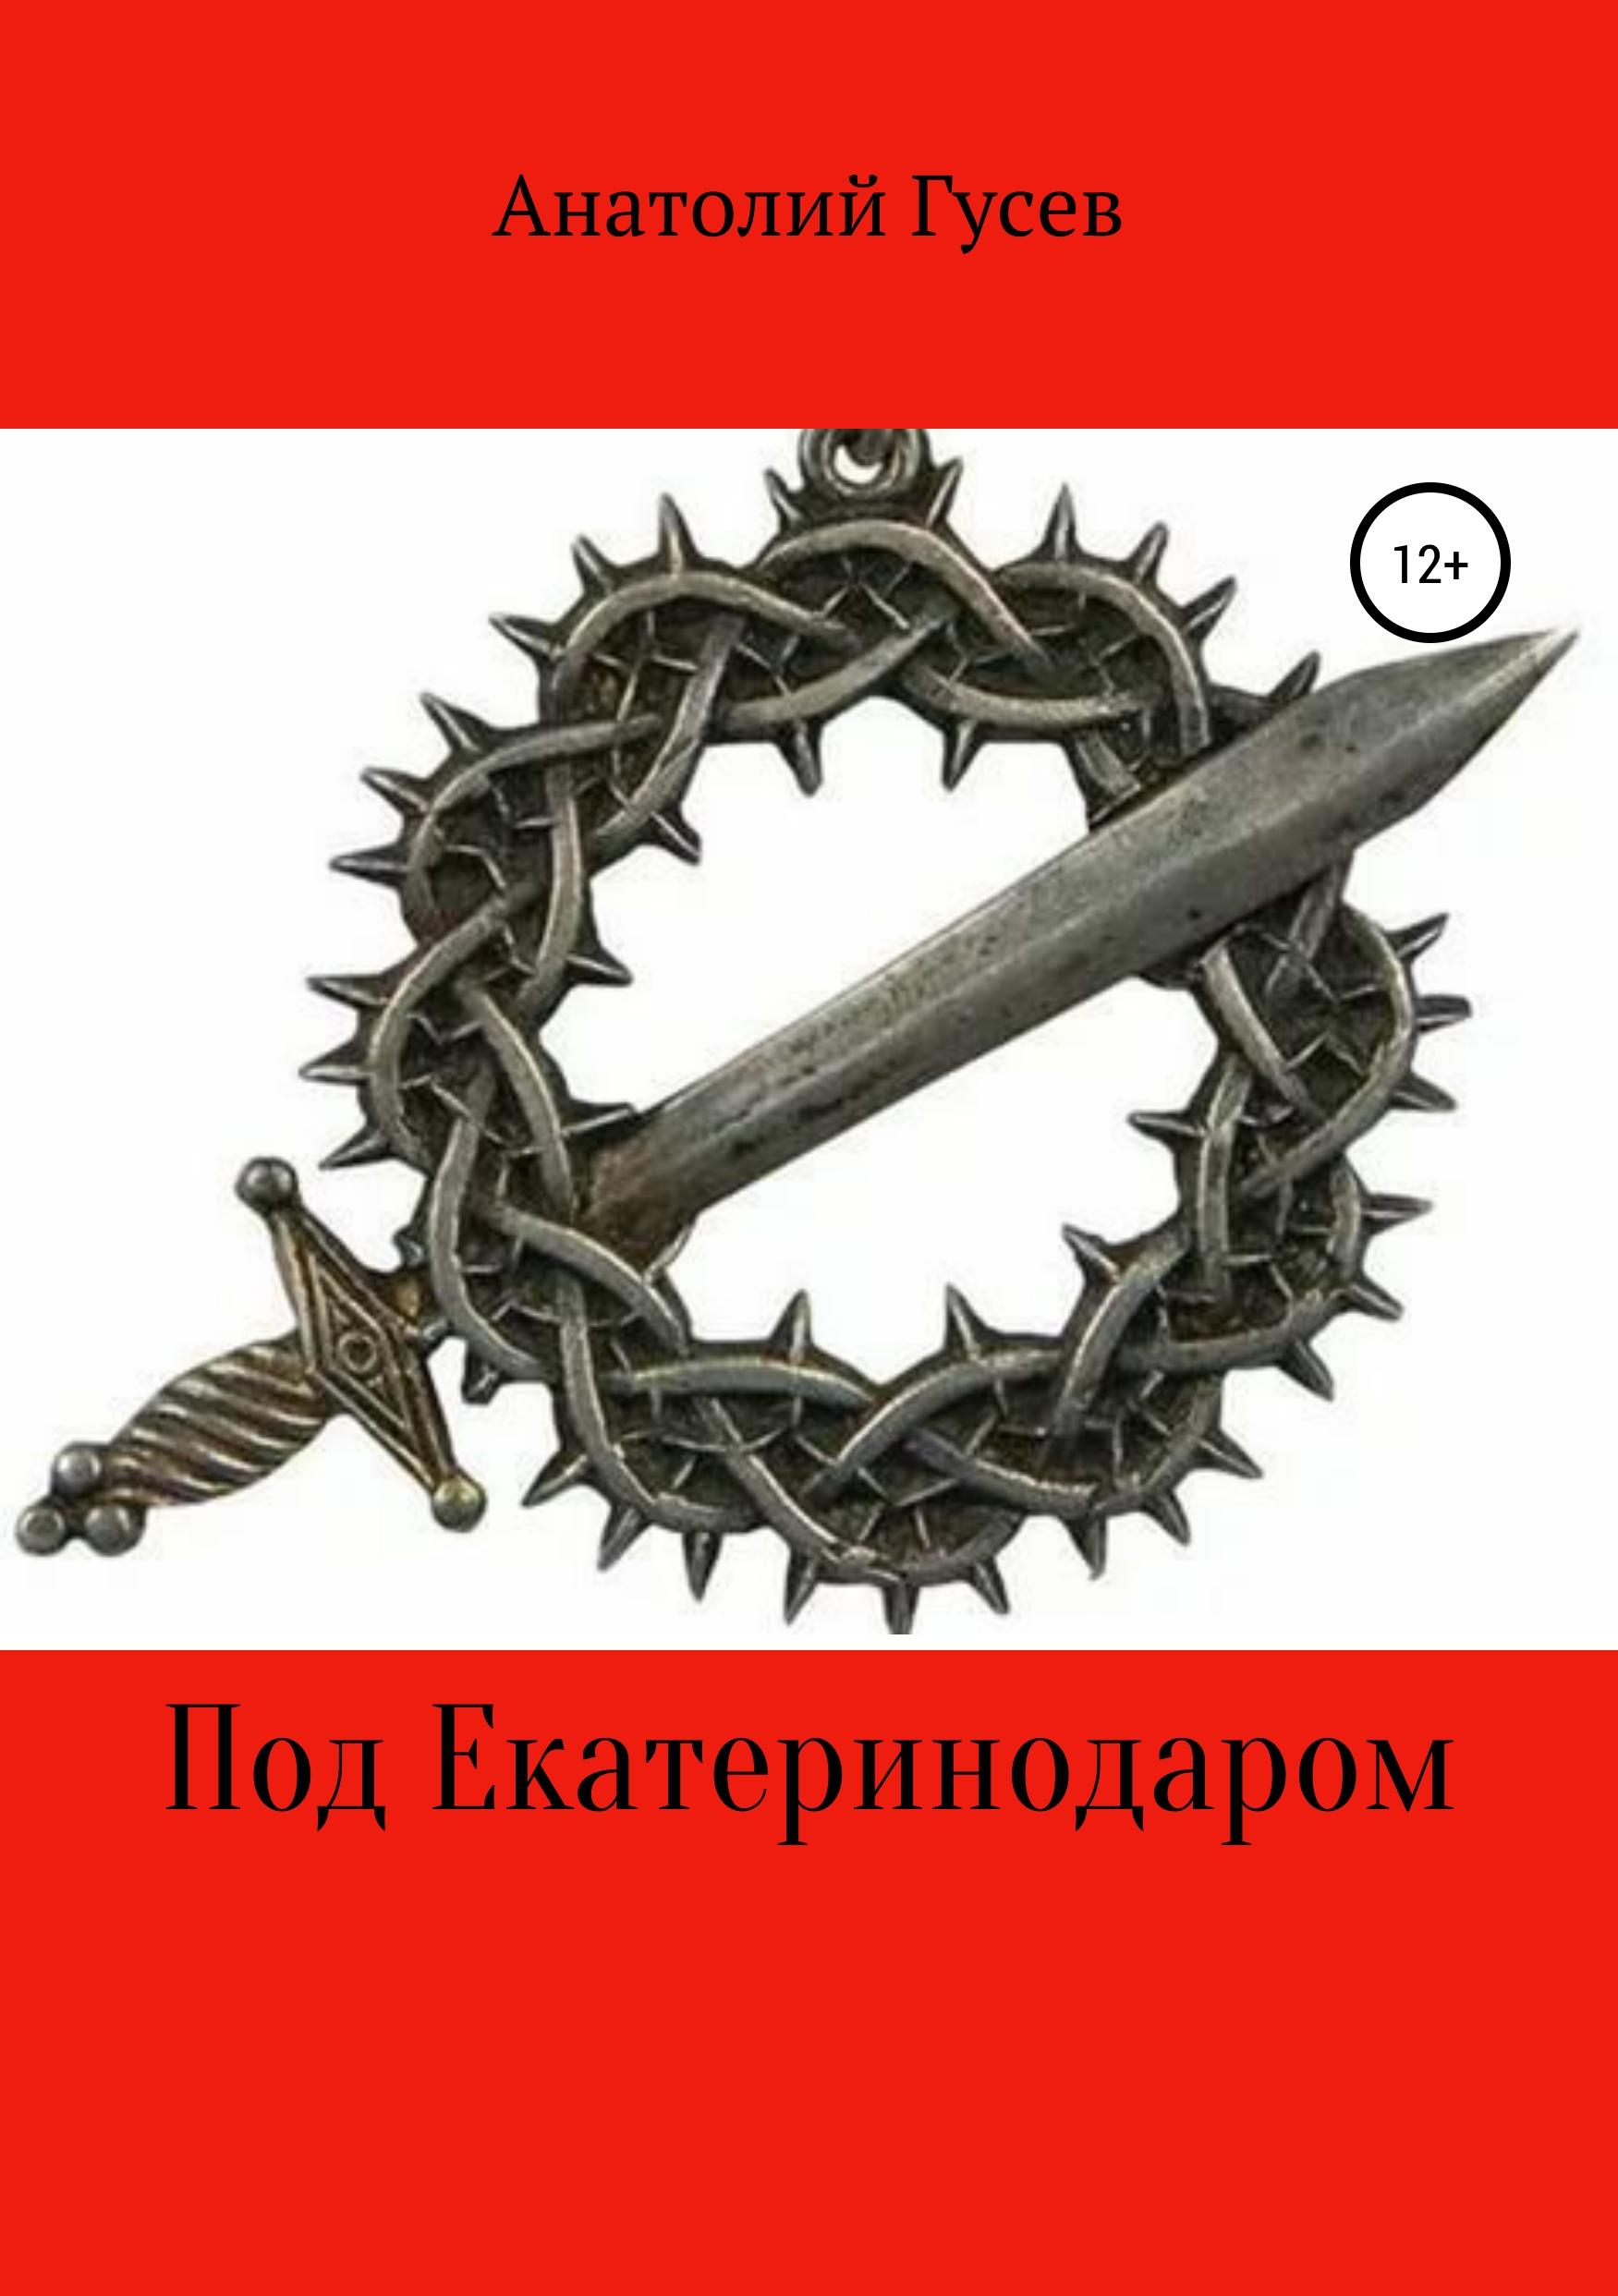 Анатолий Алексеевич Гусев Под Екатеринодаром анатолий алексеевич гусев петух